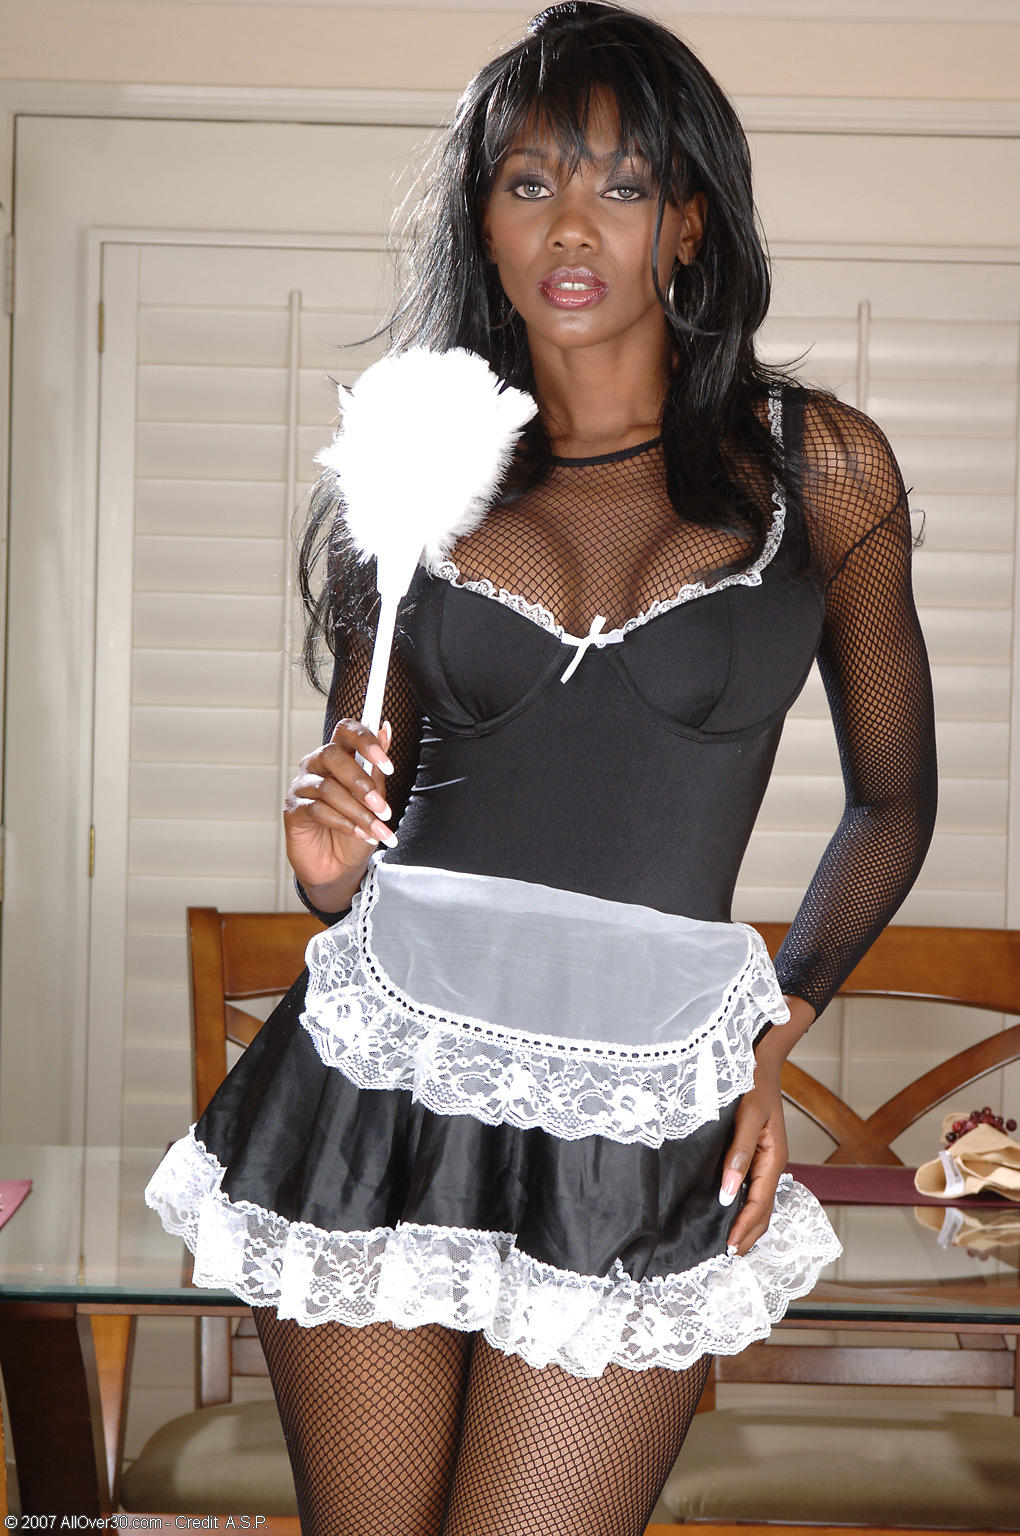 fuck the black maid - interracial - xxx photos